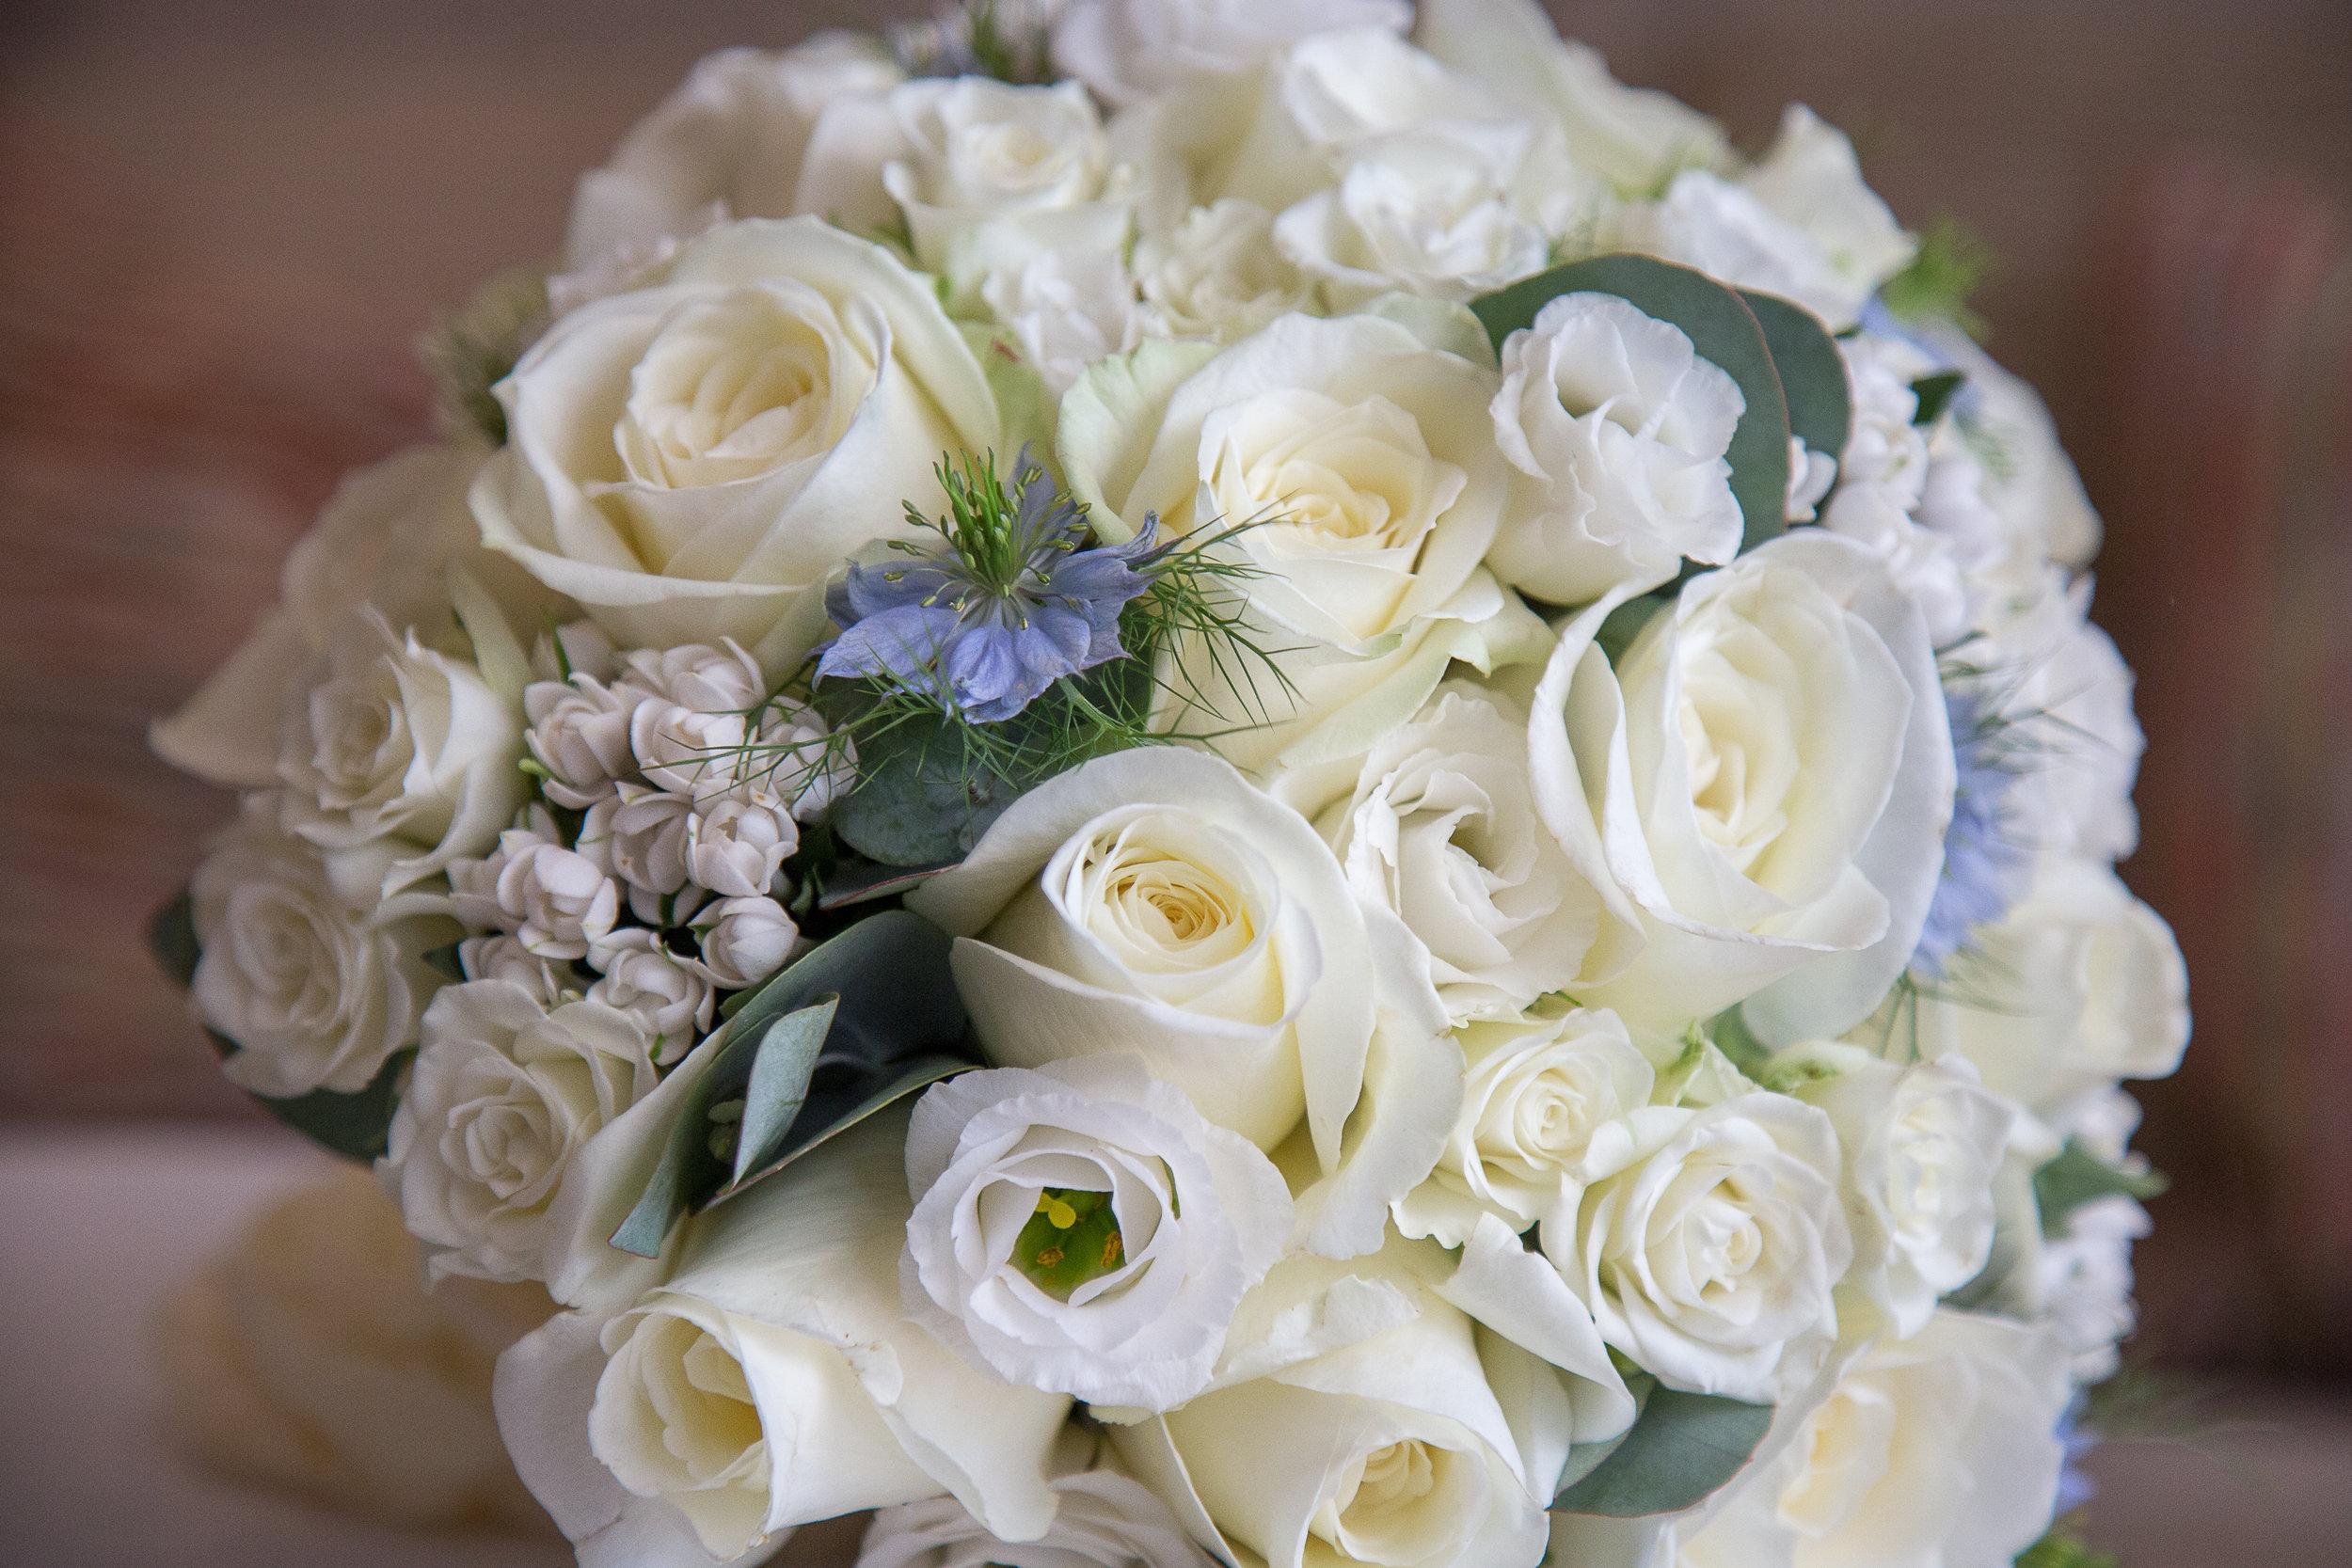 Sadie and Gary - White and Blue Wedding